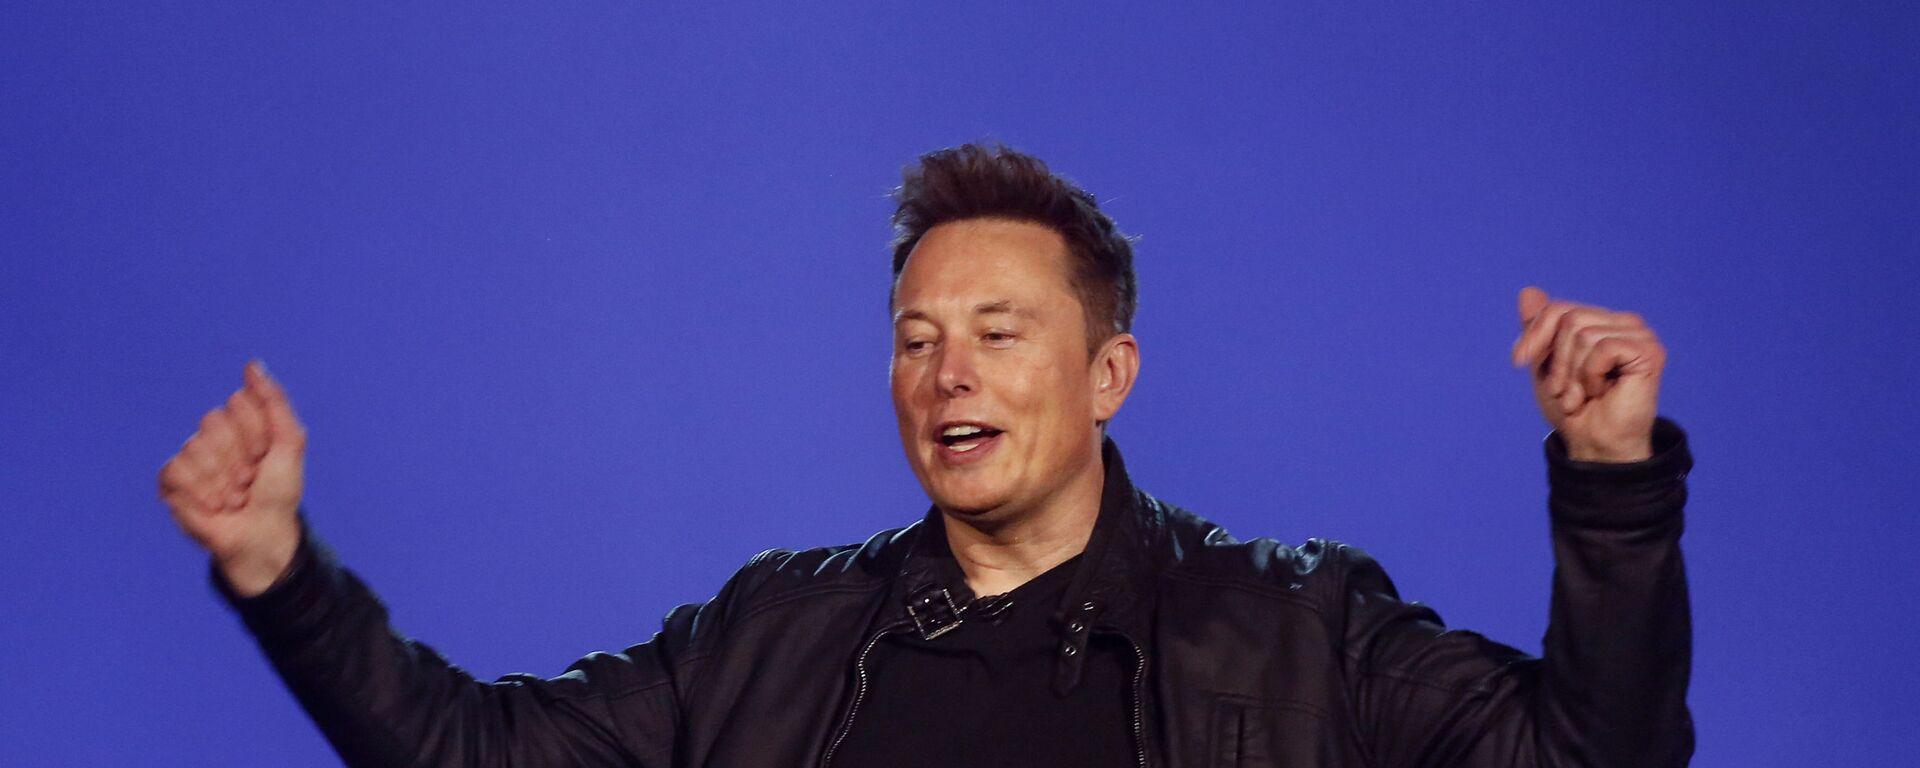 Elon Musk, inventor y emprendedor estadounidense - Sputnik Mundo, 1920, 04.06.2021